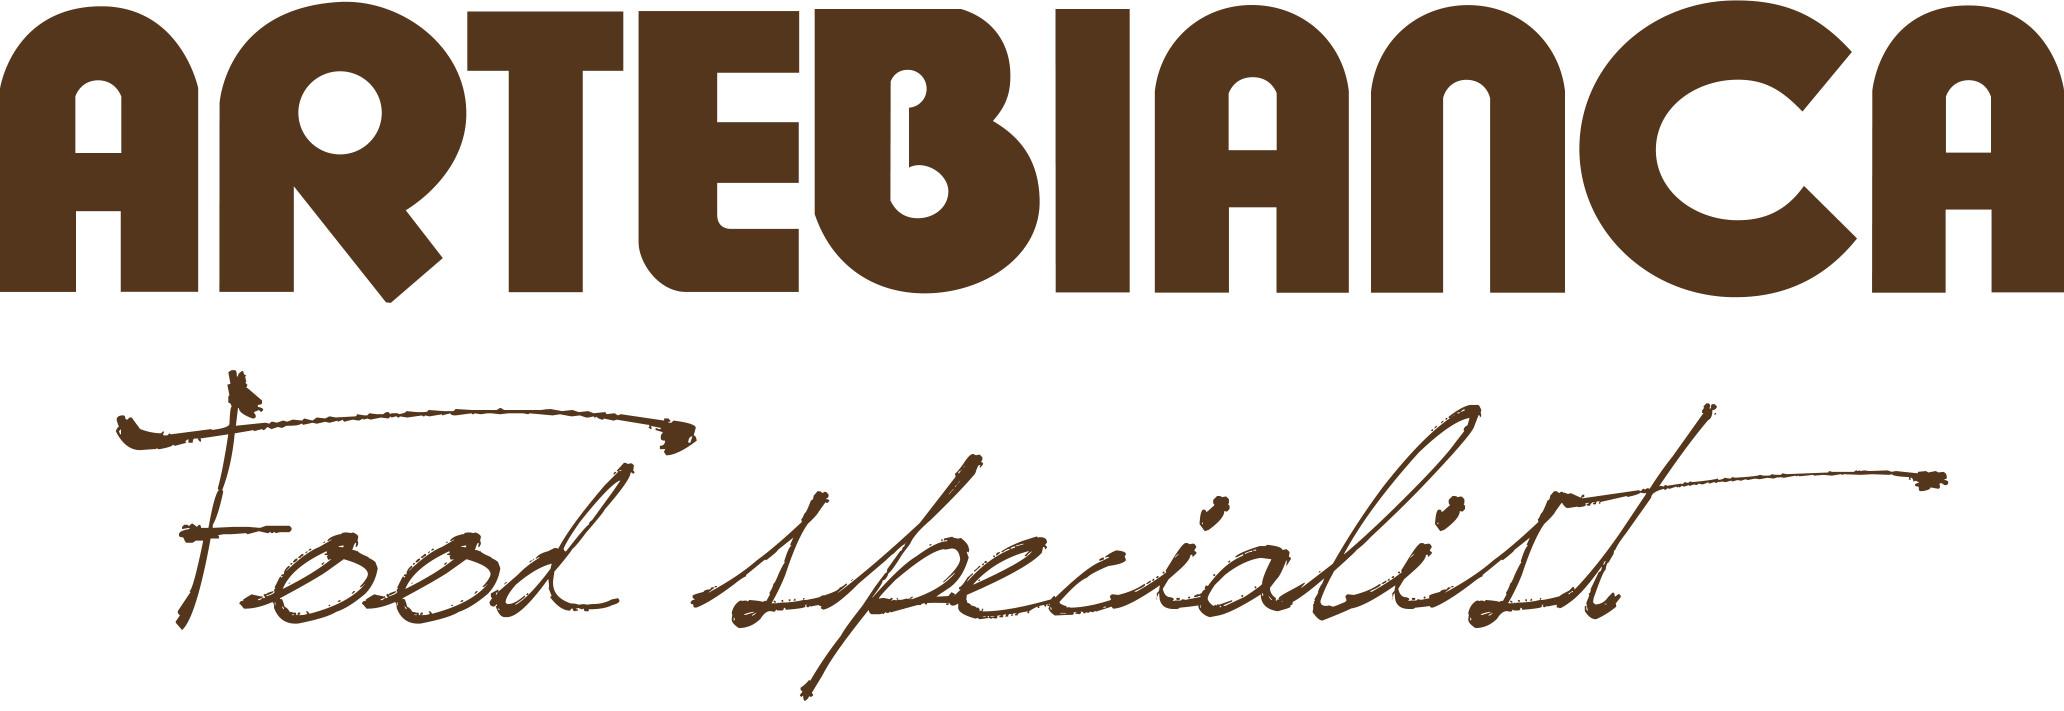 ARTEBIANCA Food Specialist